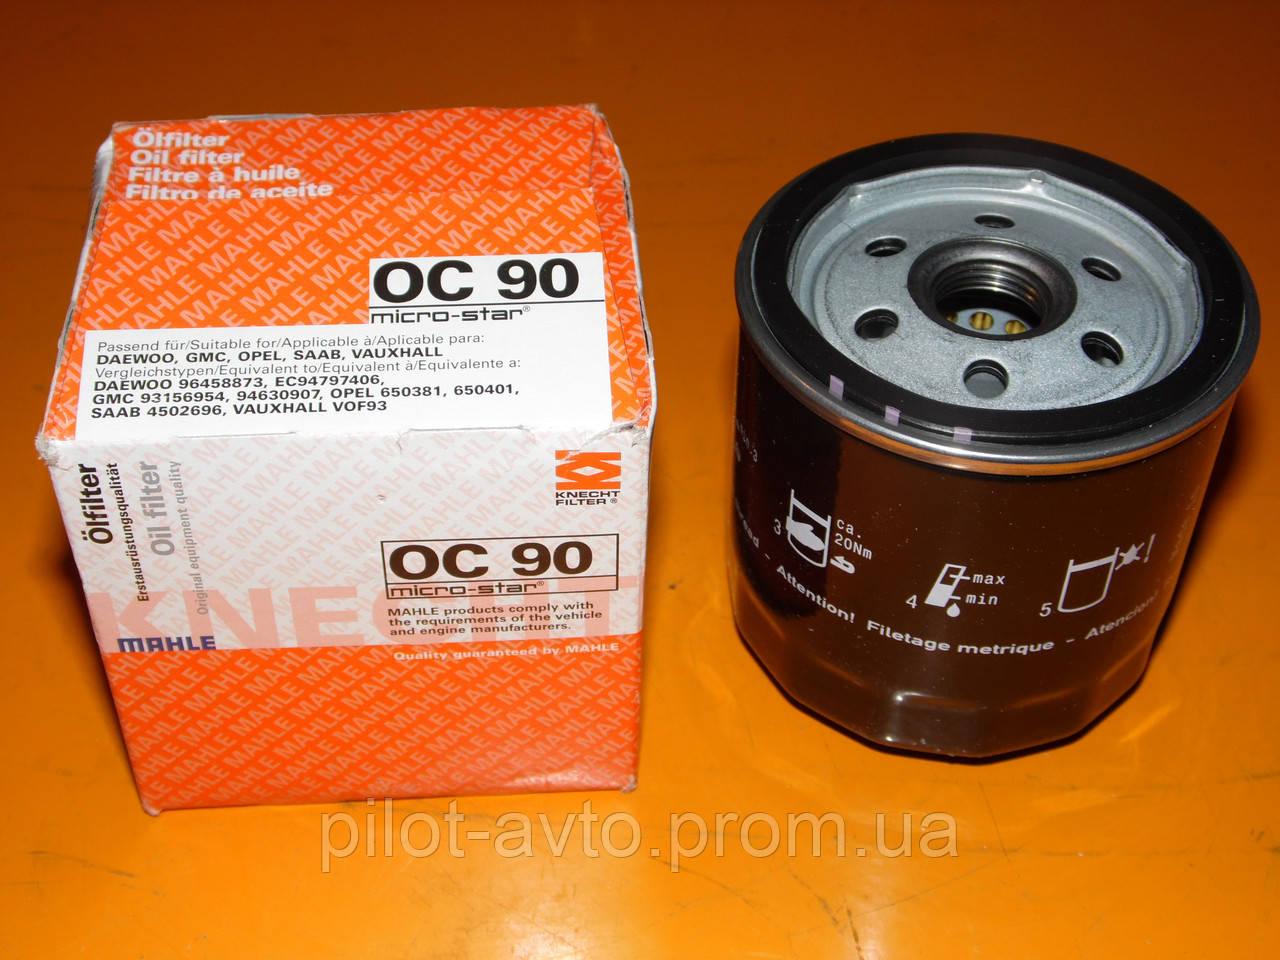 Knecht OC 90 Oil Filter